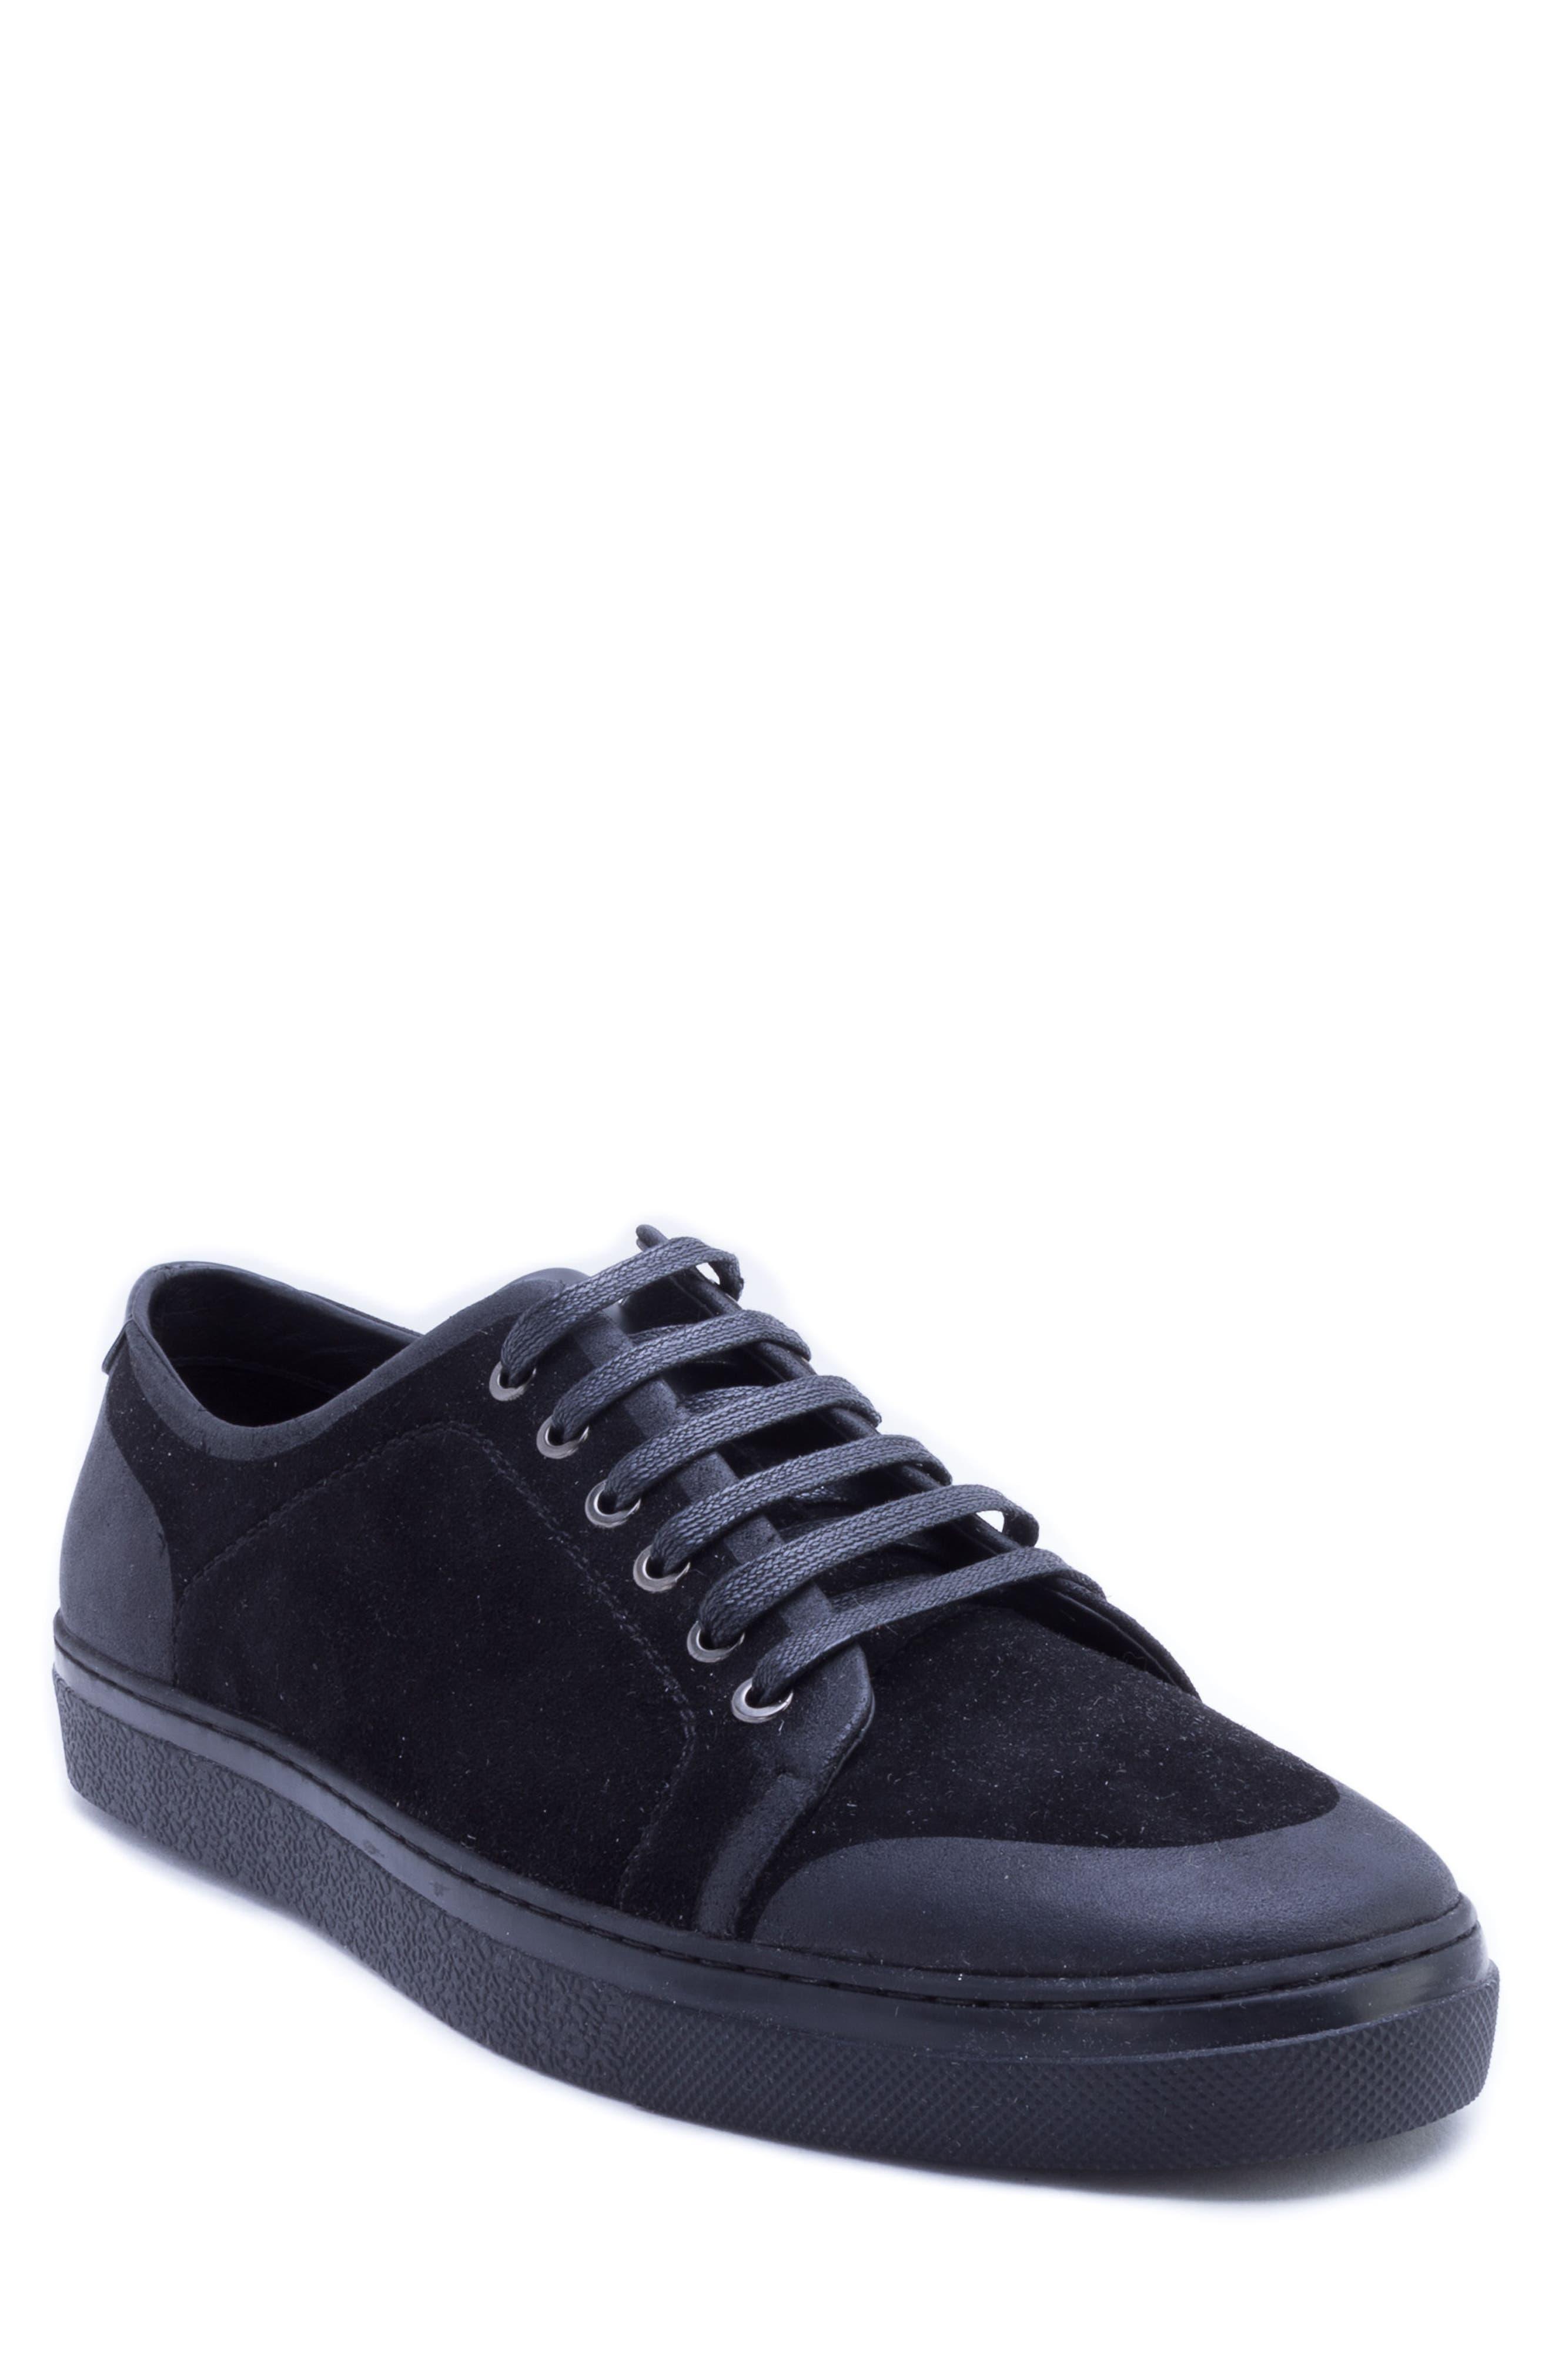 Garfield Sneaker,                         Main,                         color, BLACK LEATHER